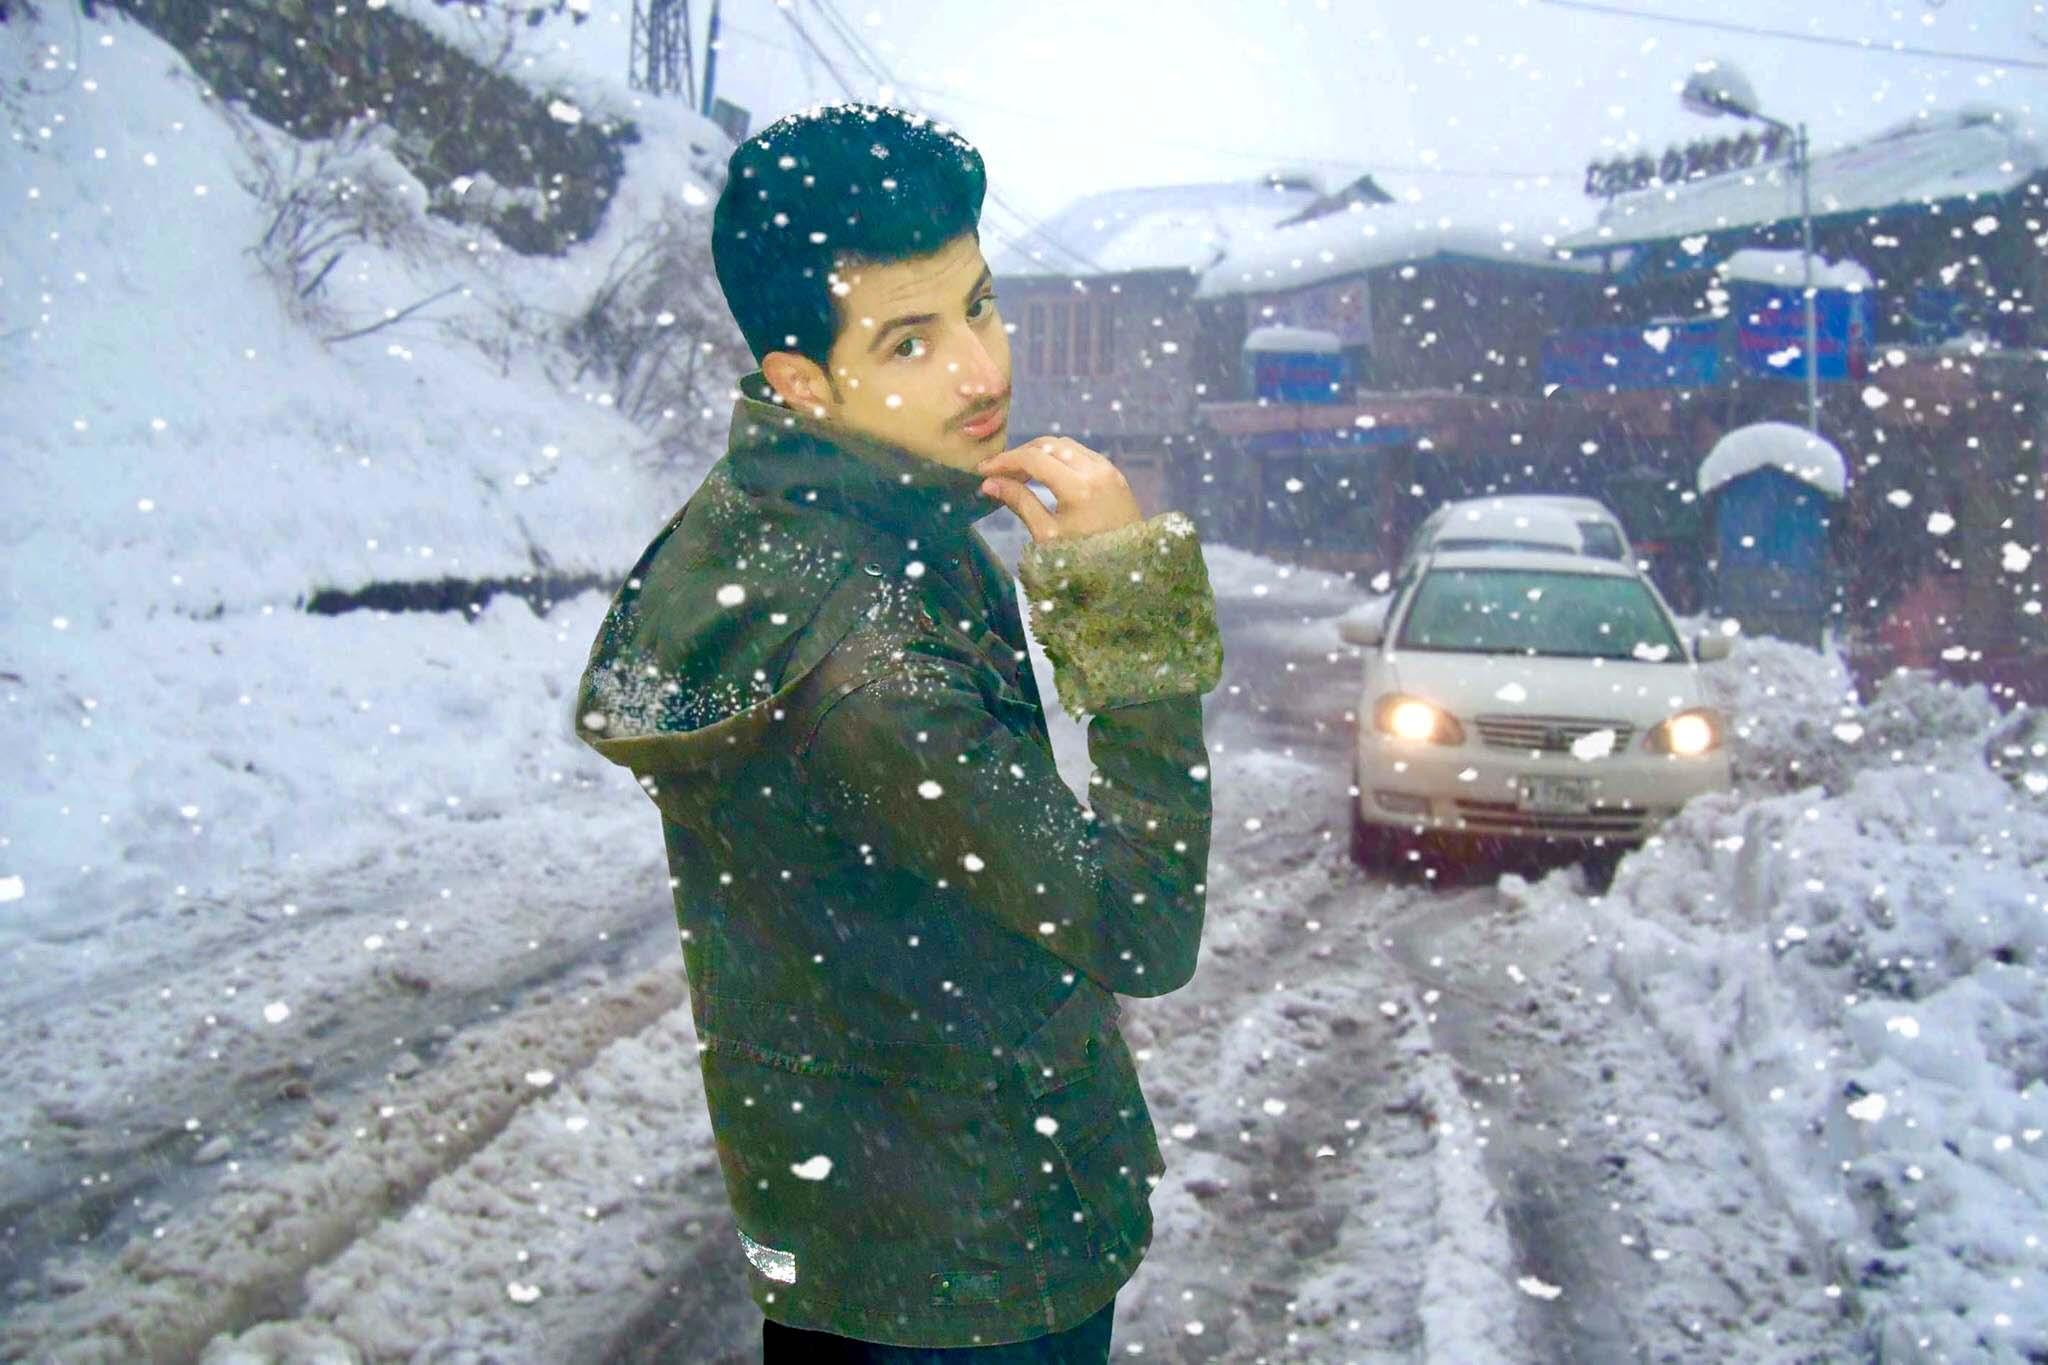 Shaddy14 picha Shaddy14 Snowfall picha Editor : Snowfall picha Frame